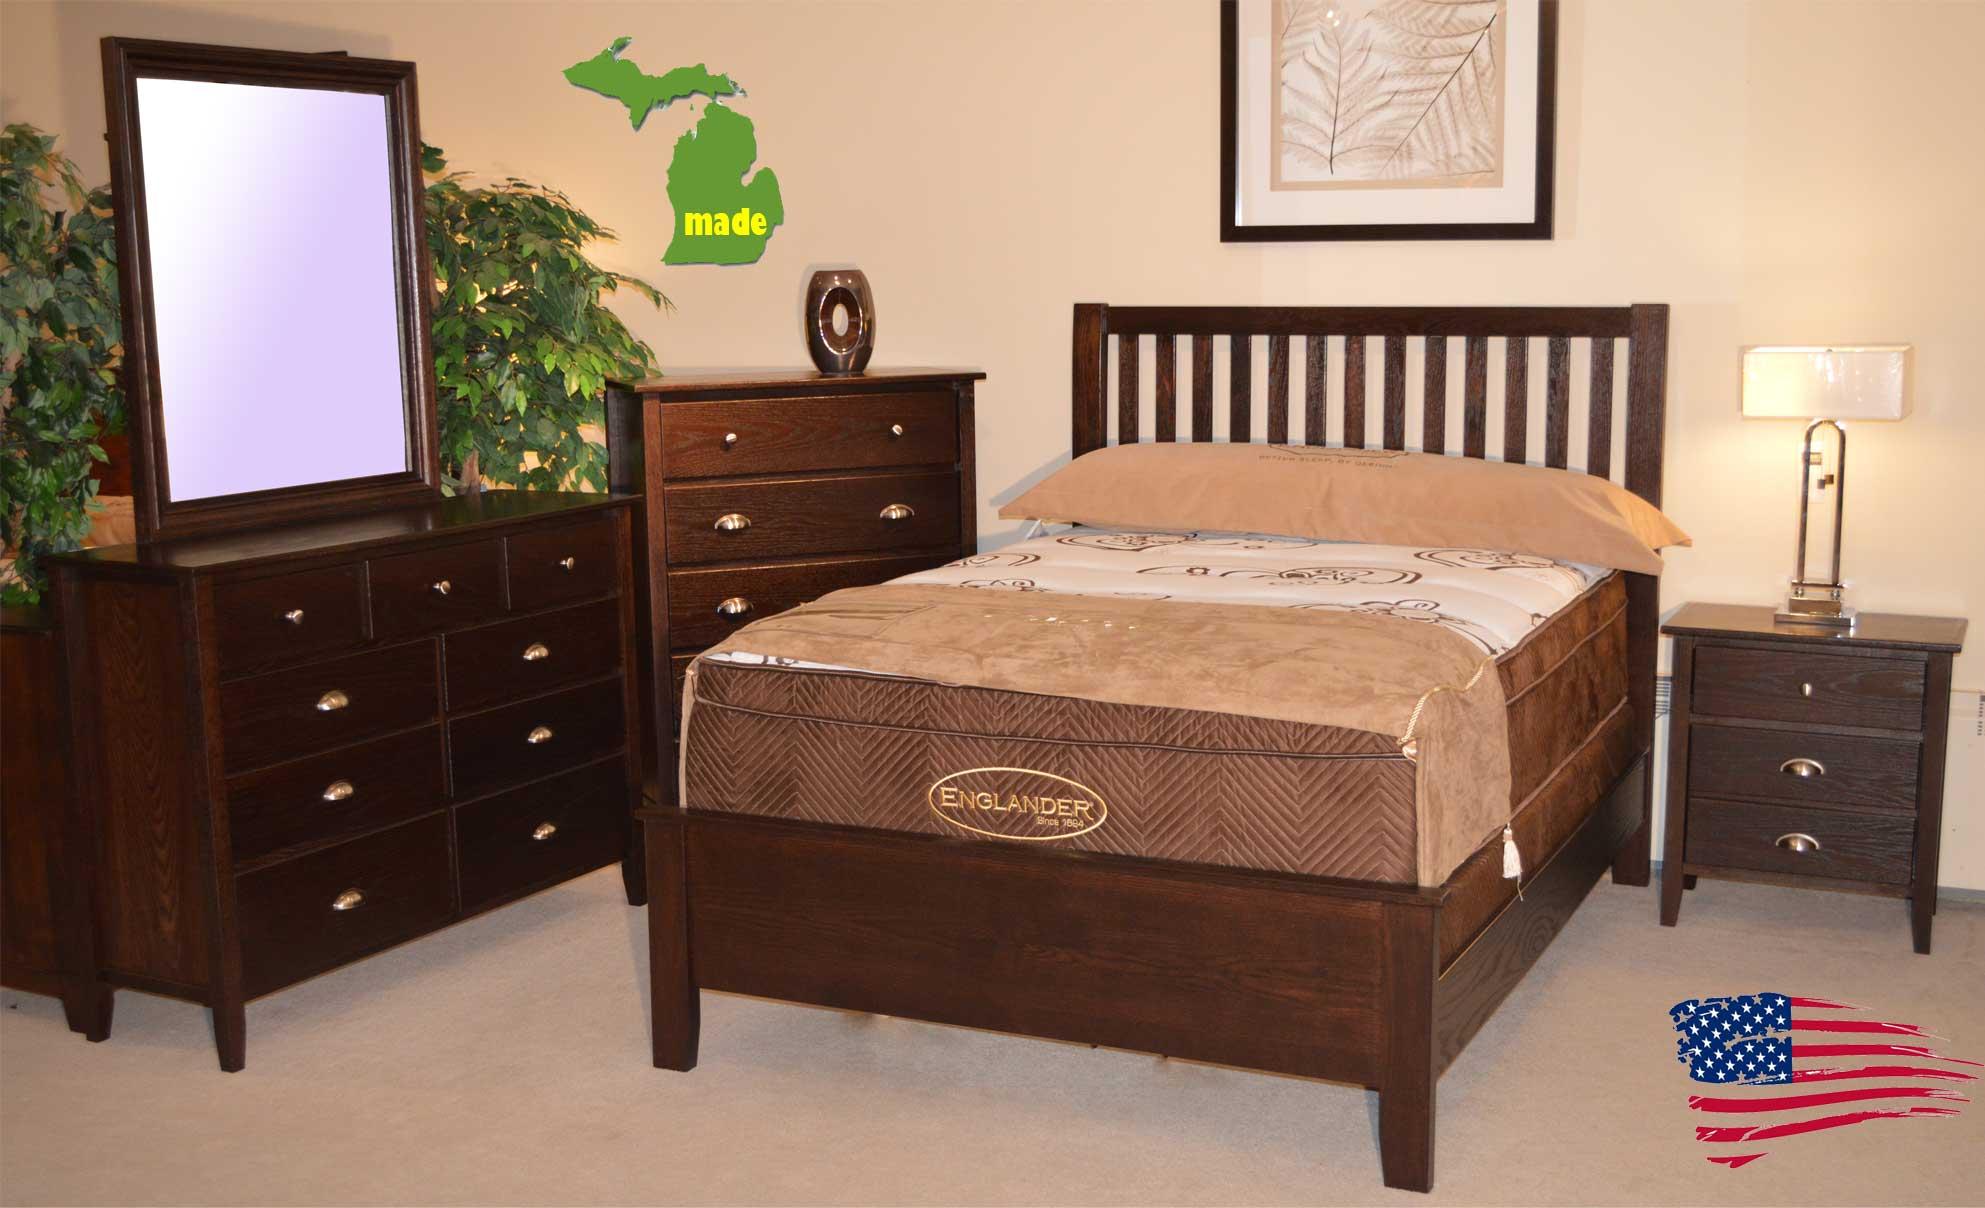 Made In Michigan Huron Jasen S Fine Furniture Since 1951